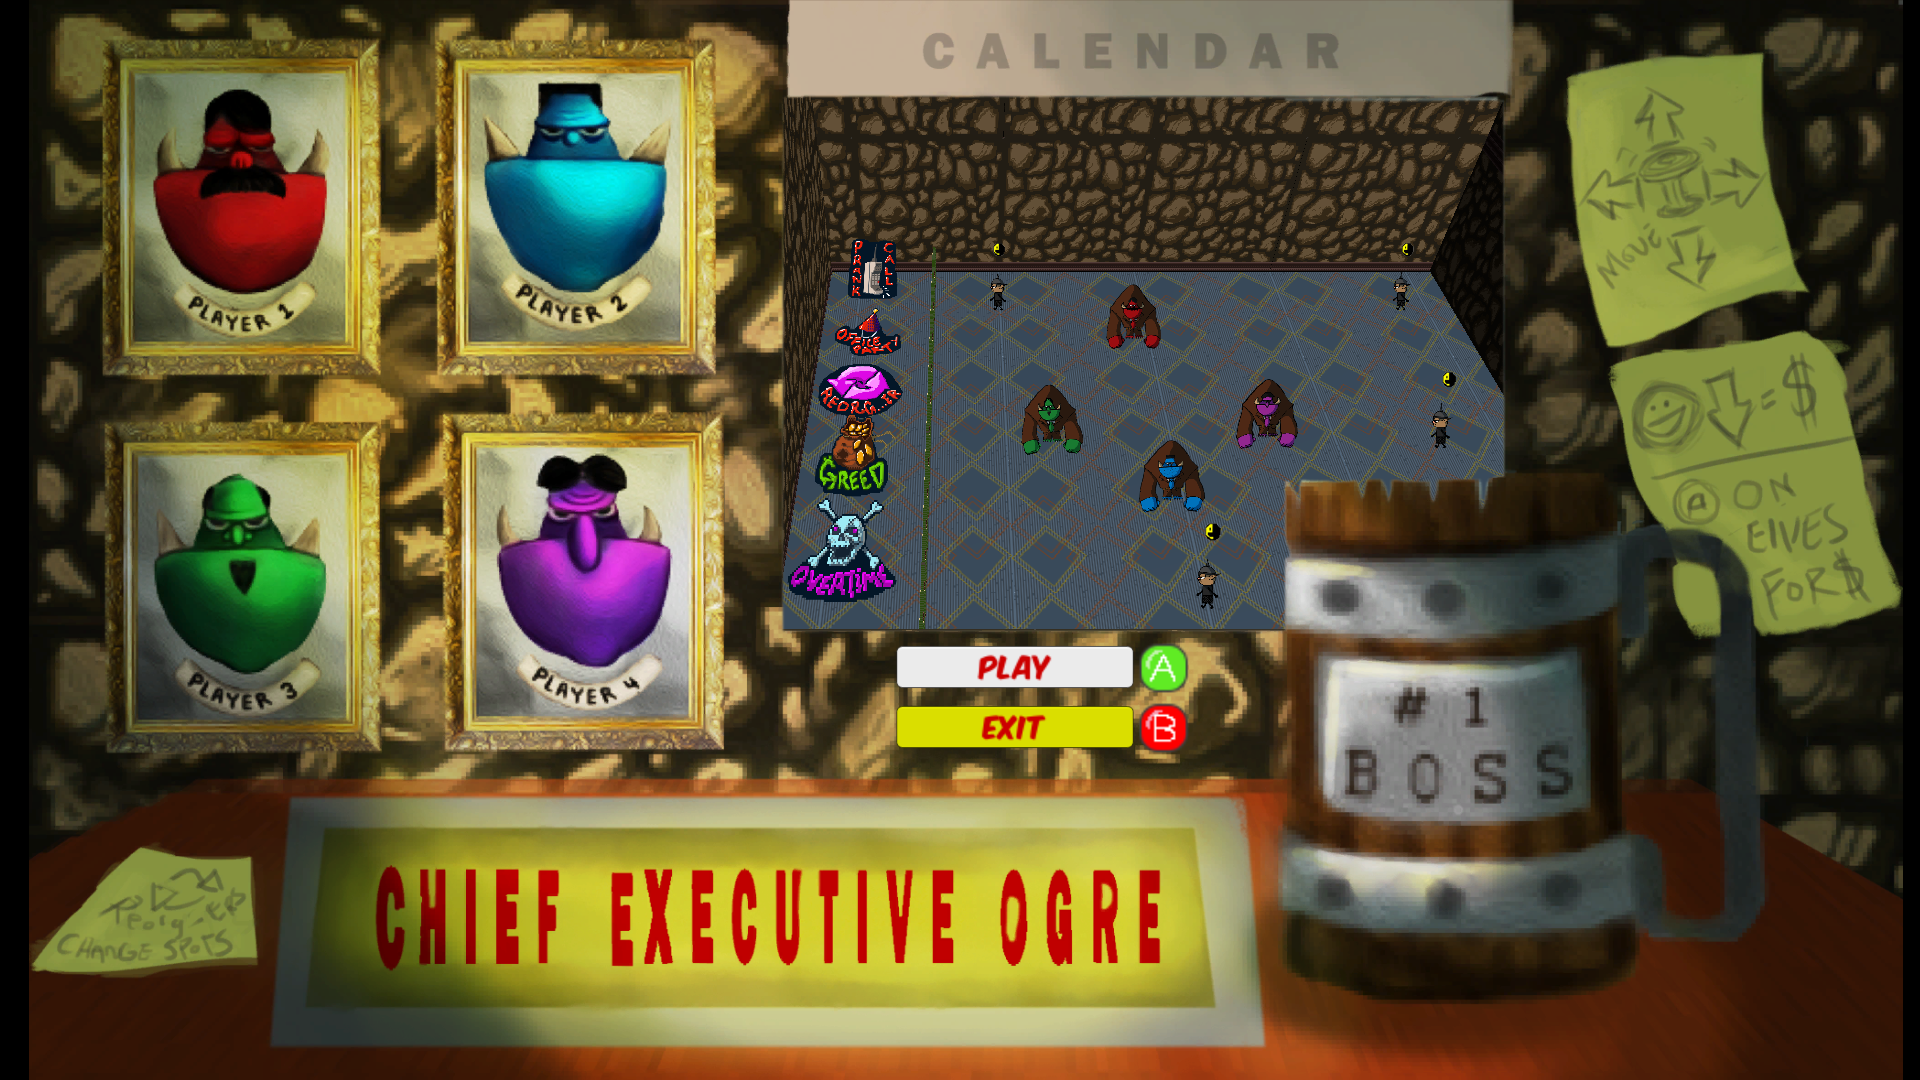 Chief Executive Ogre